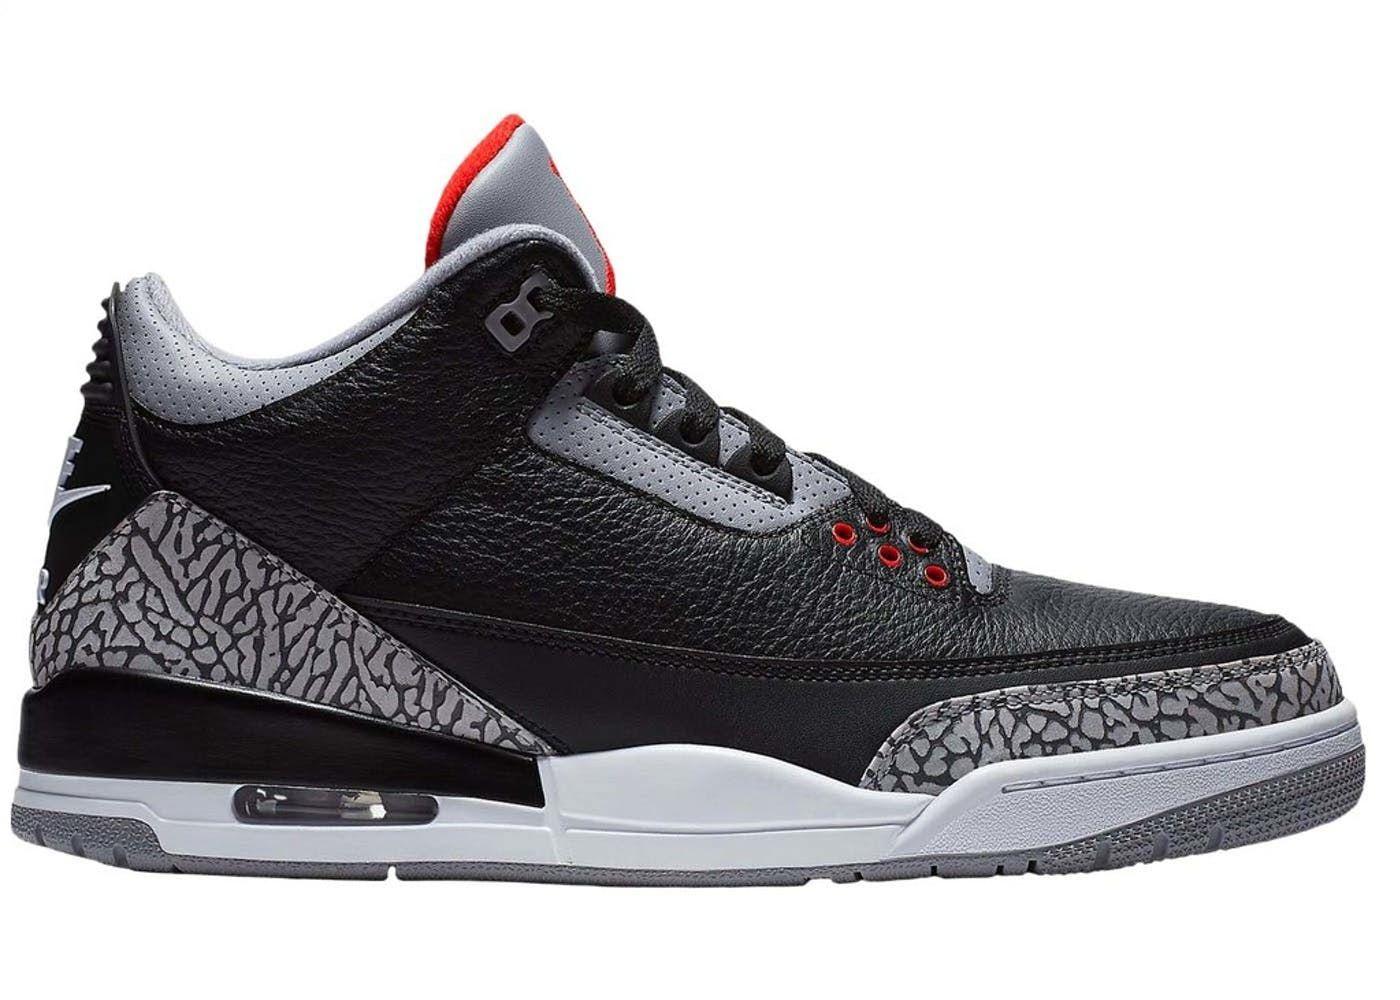 Jordan 3 Retro Black Cement 2018 Jordan 3 Black Cement Black Cement Jordans